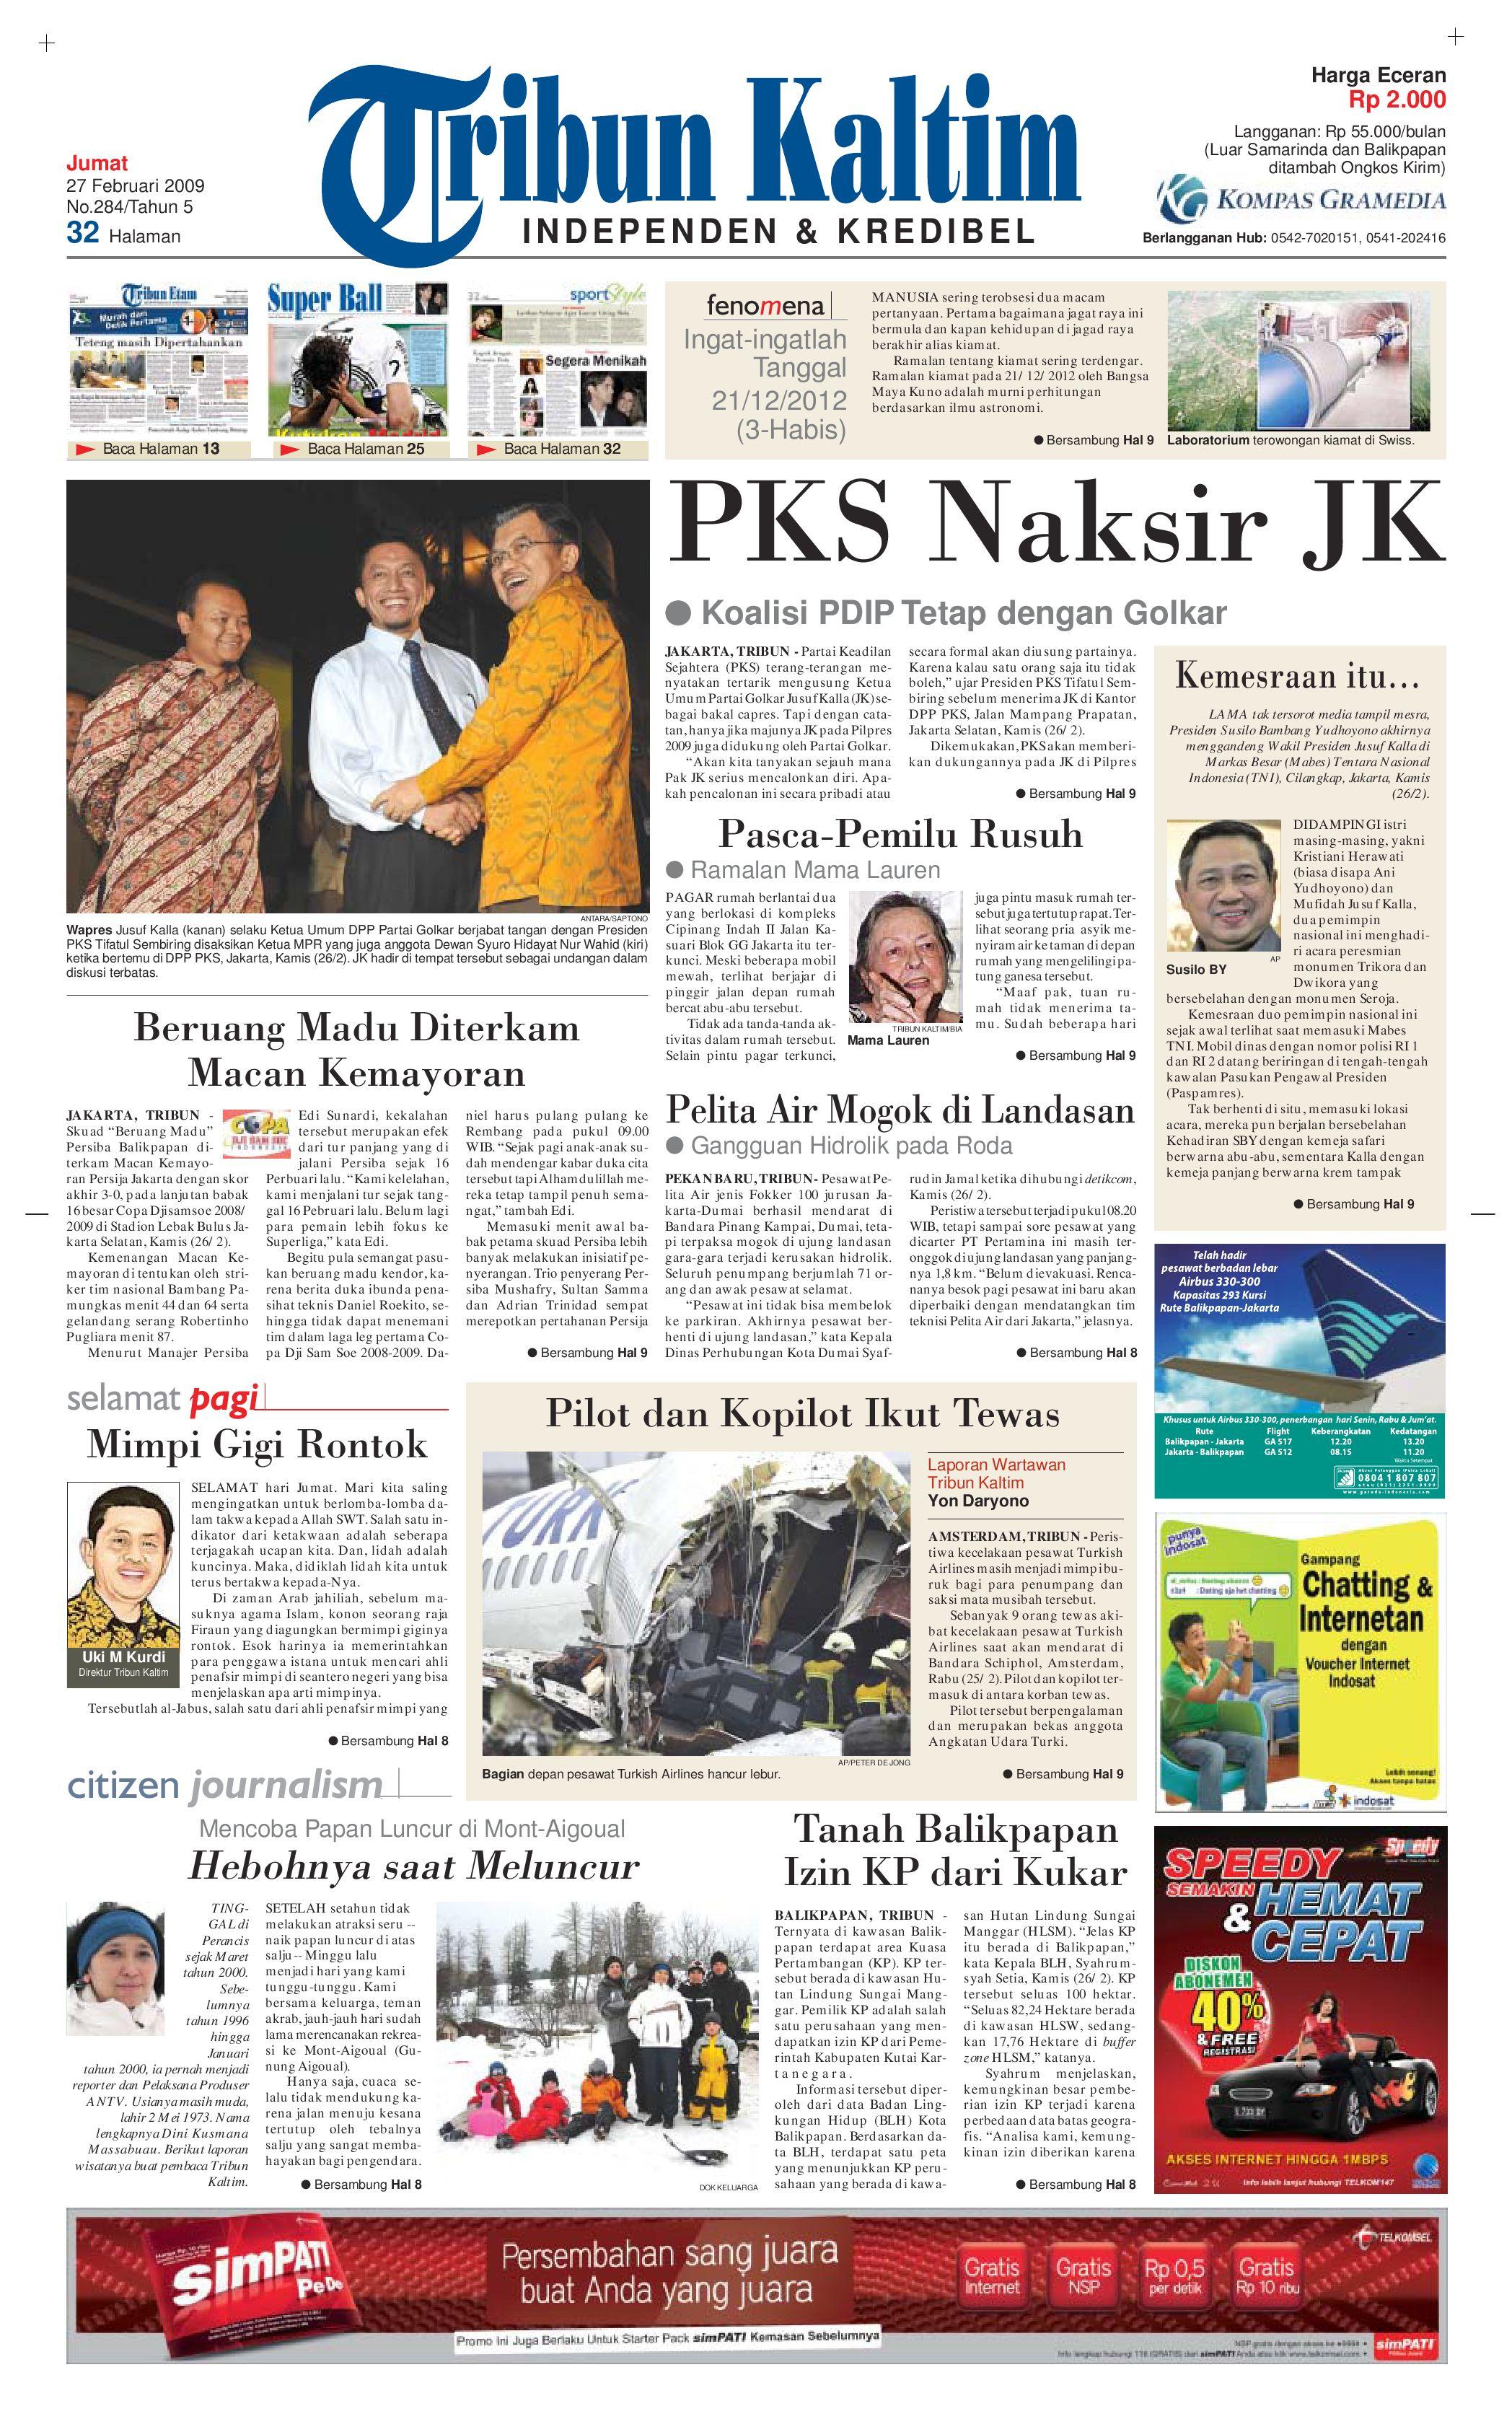 TRIBUN KALTIM 27 FEBRUARI 2009 by tohir tribun - issuu e1c4706d94